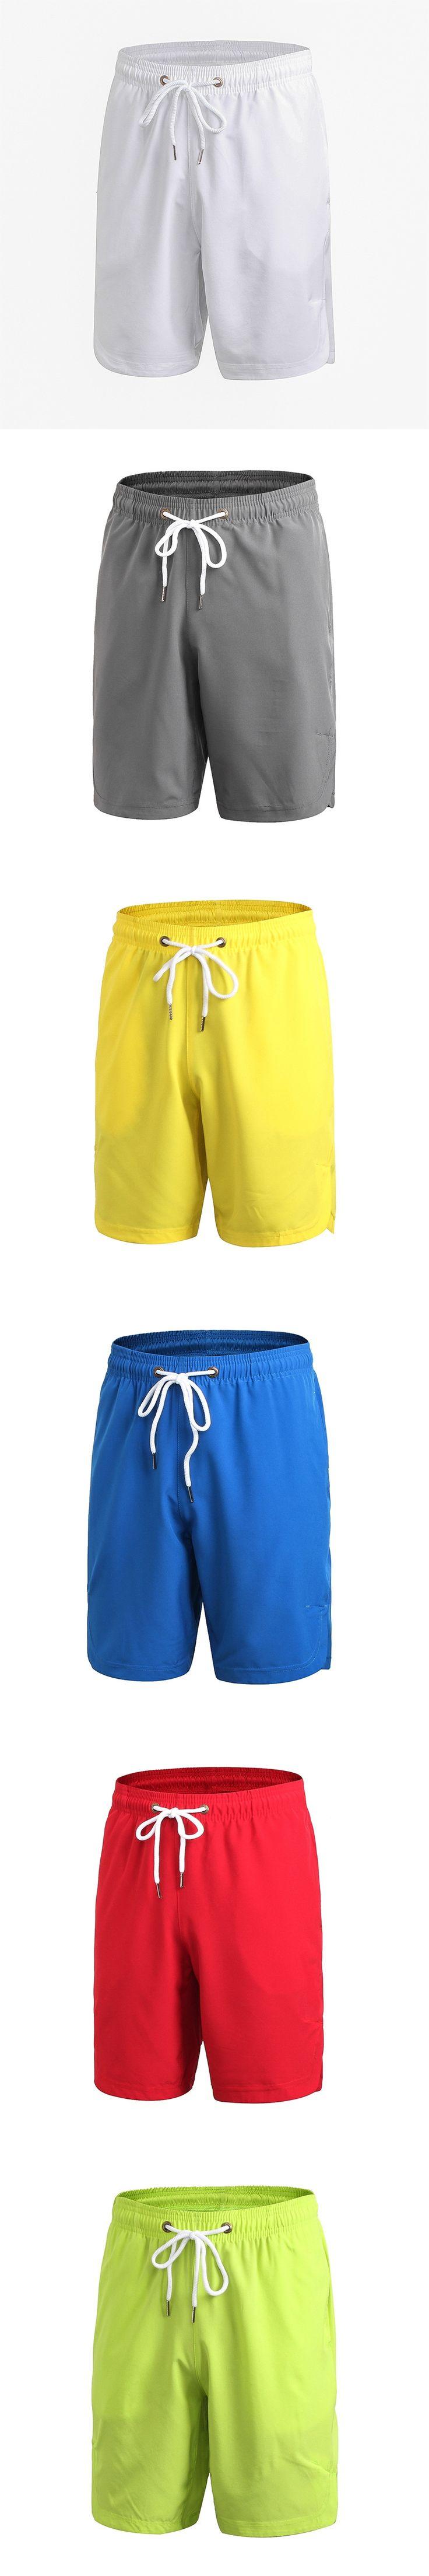 Men's Sports Shorts Fitness Running Basketball Shorts Loose Quick dry Shorts men sportswear elastic Leisure training Breathable